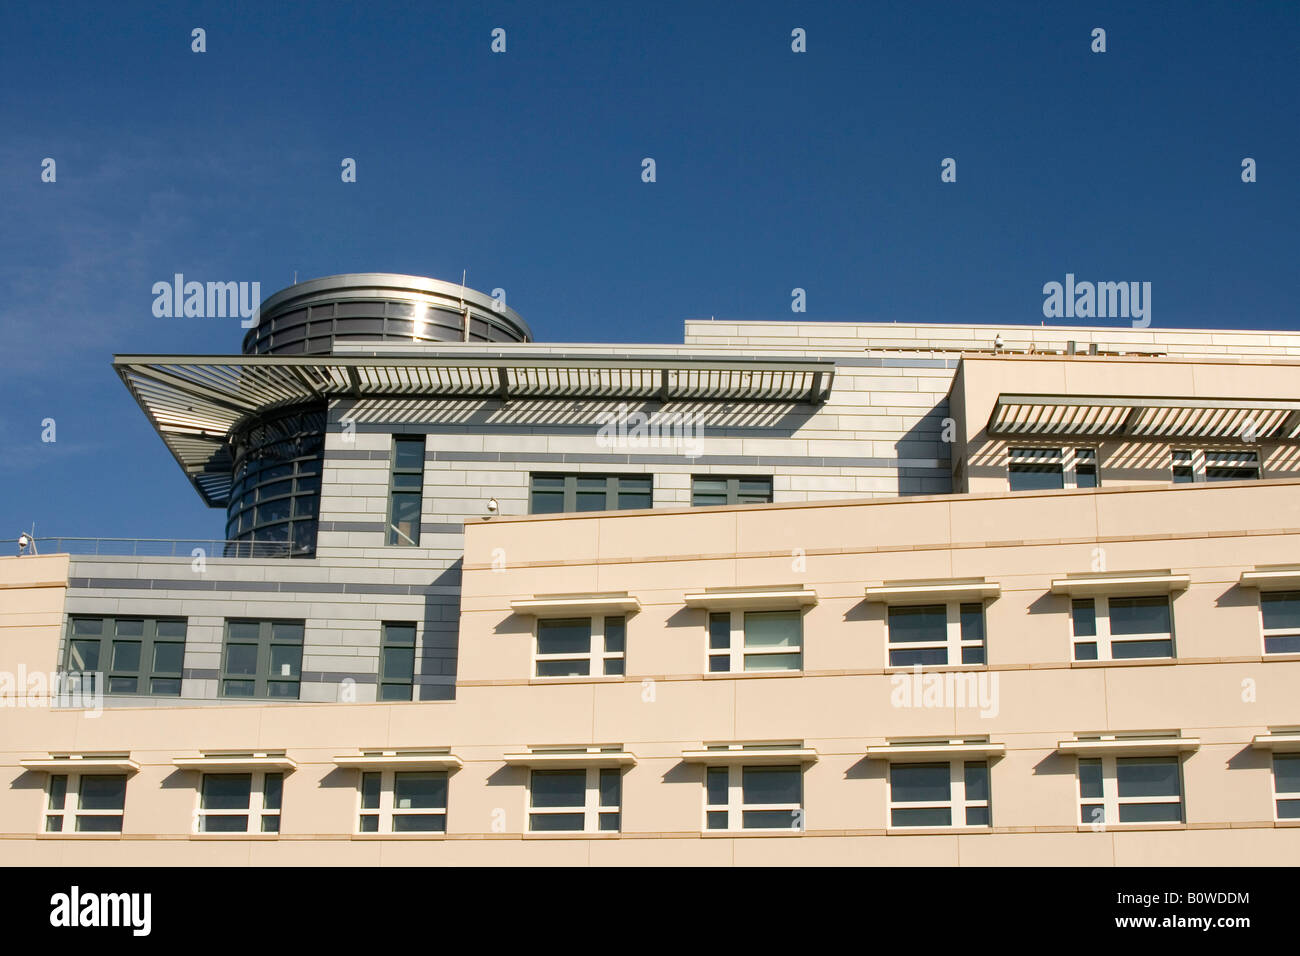 Embassy of the United States of America, U.S. Embassy, Berlin, Germany, Europe - Stock Image